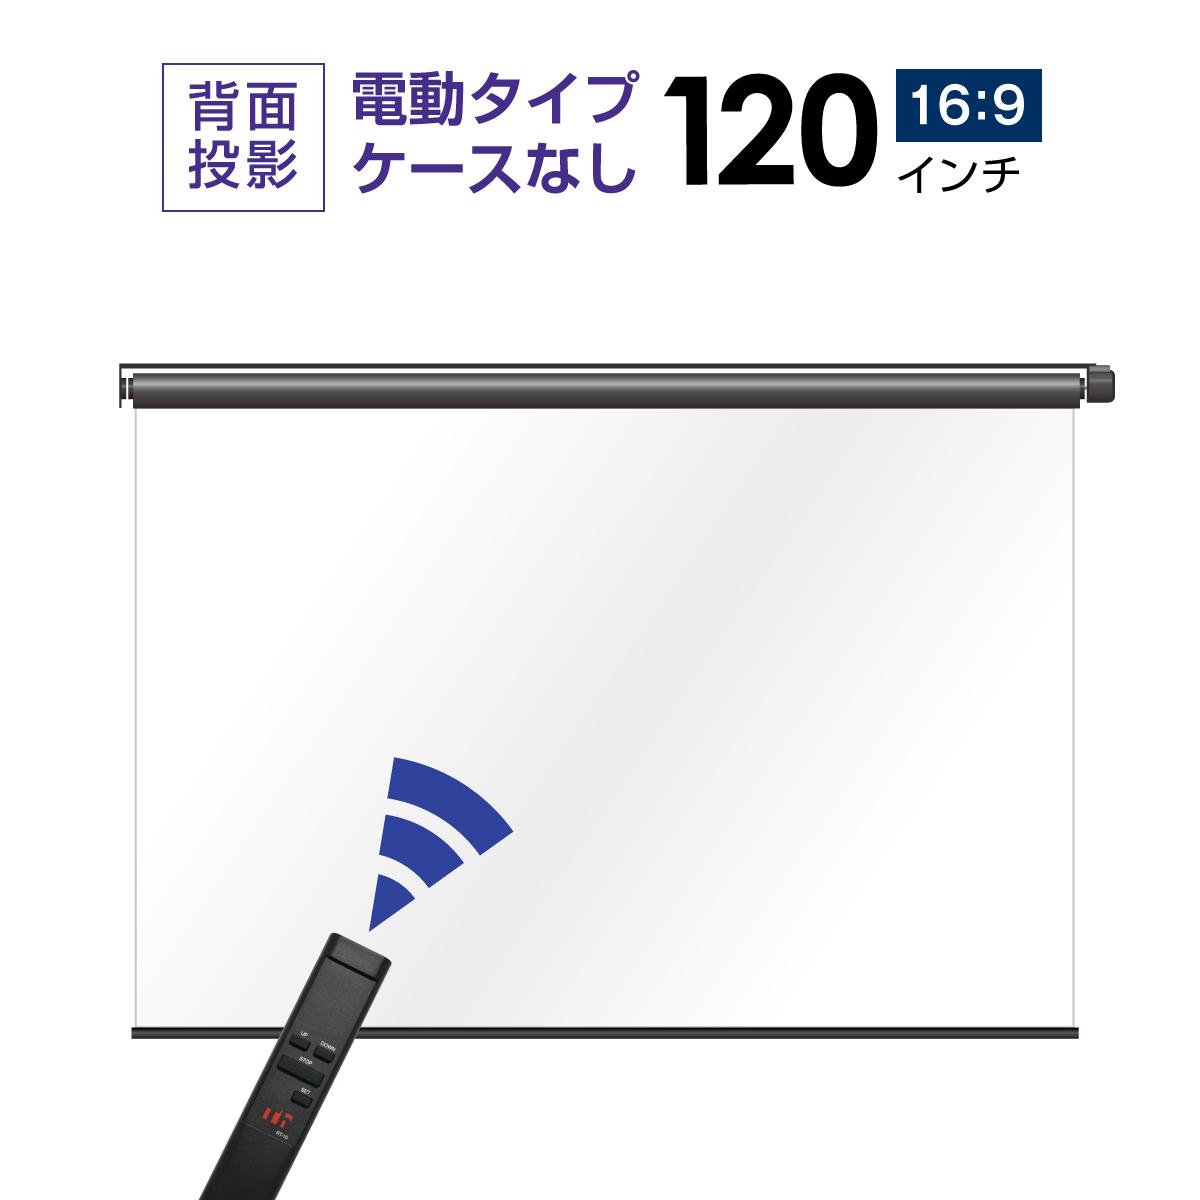 BDR2660FTS リア投影タイプ シアターハウス ケースなし プロジェクタースクリーン 電動スクリーン 120インチ(16:9) マスクフリー